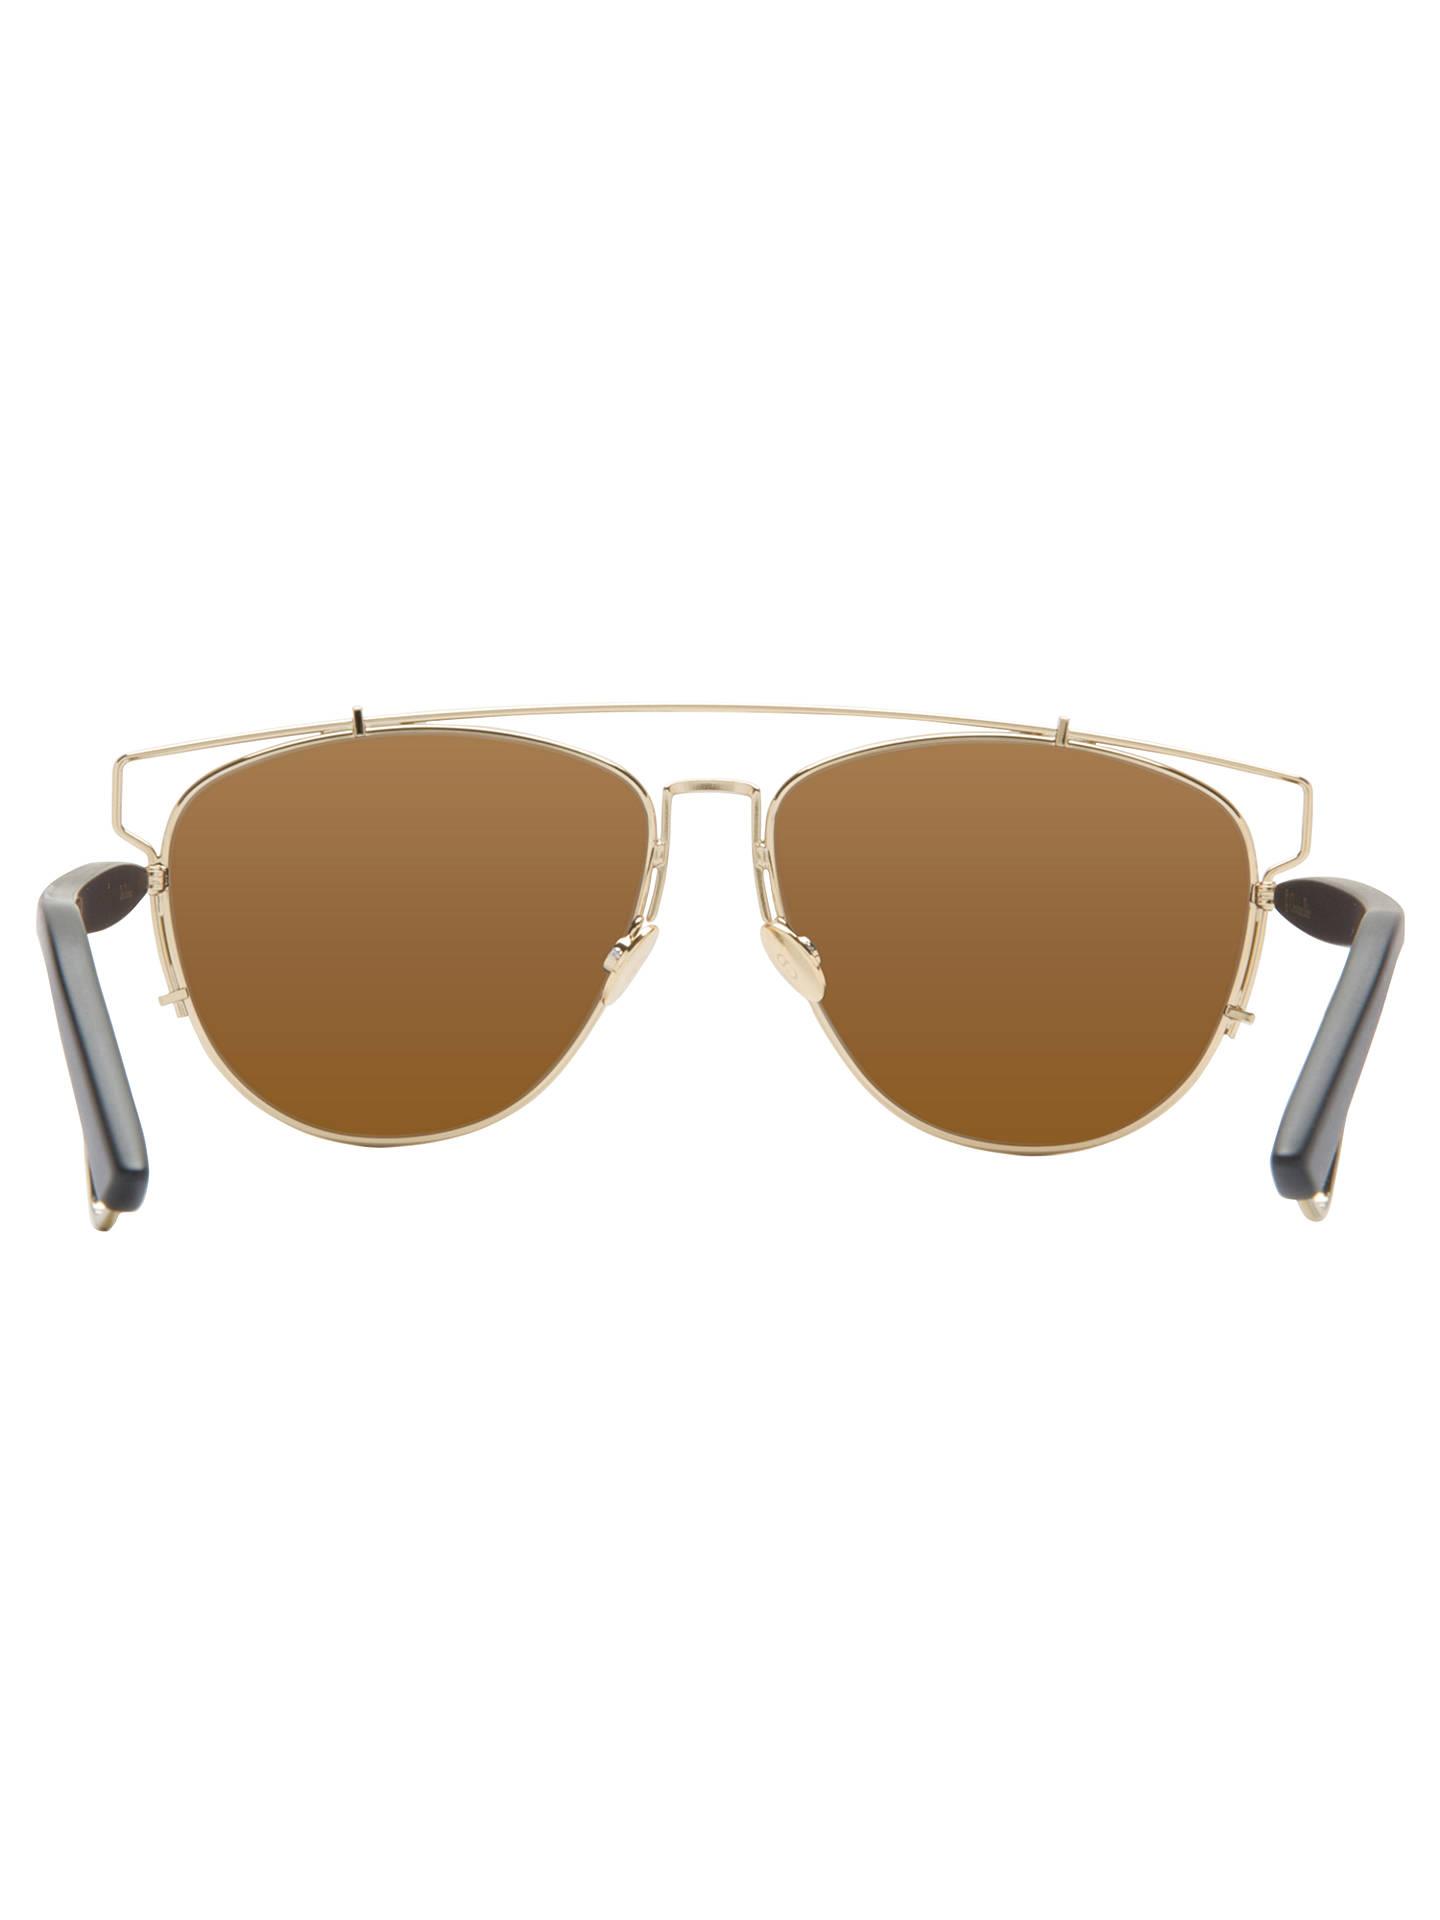 4a0facdf435c8 Christian Dior Dior Technologic Pilot Sunglasses at John Lewis ...